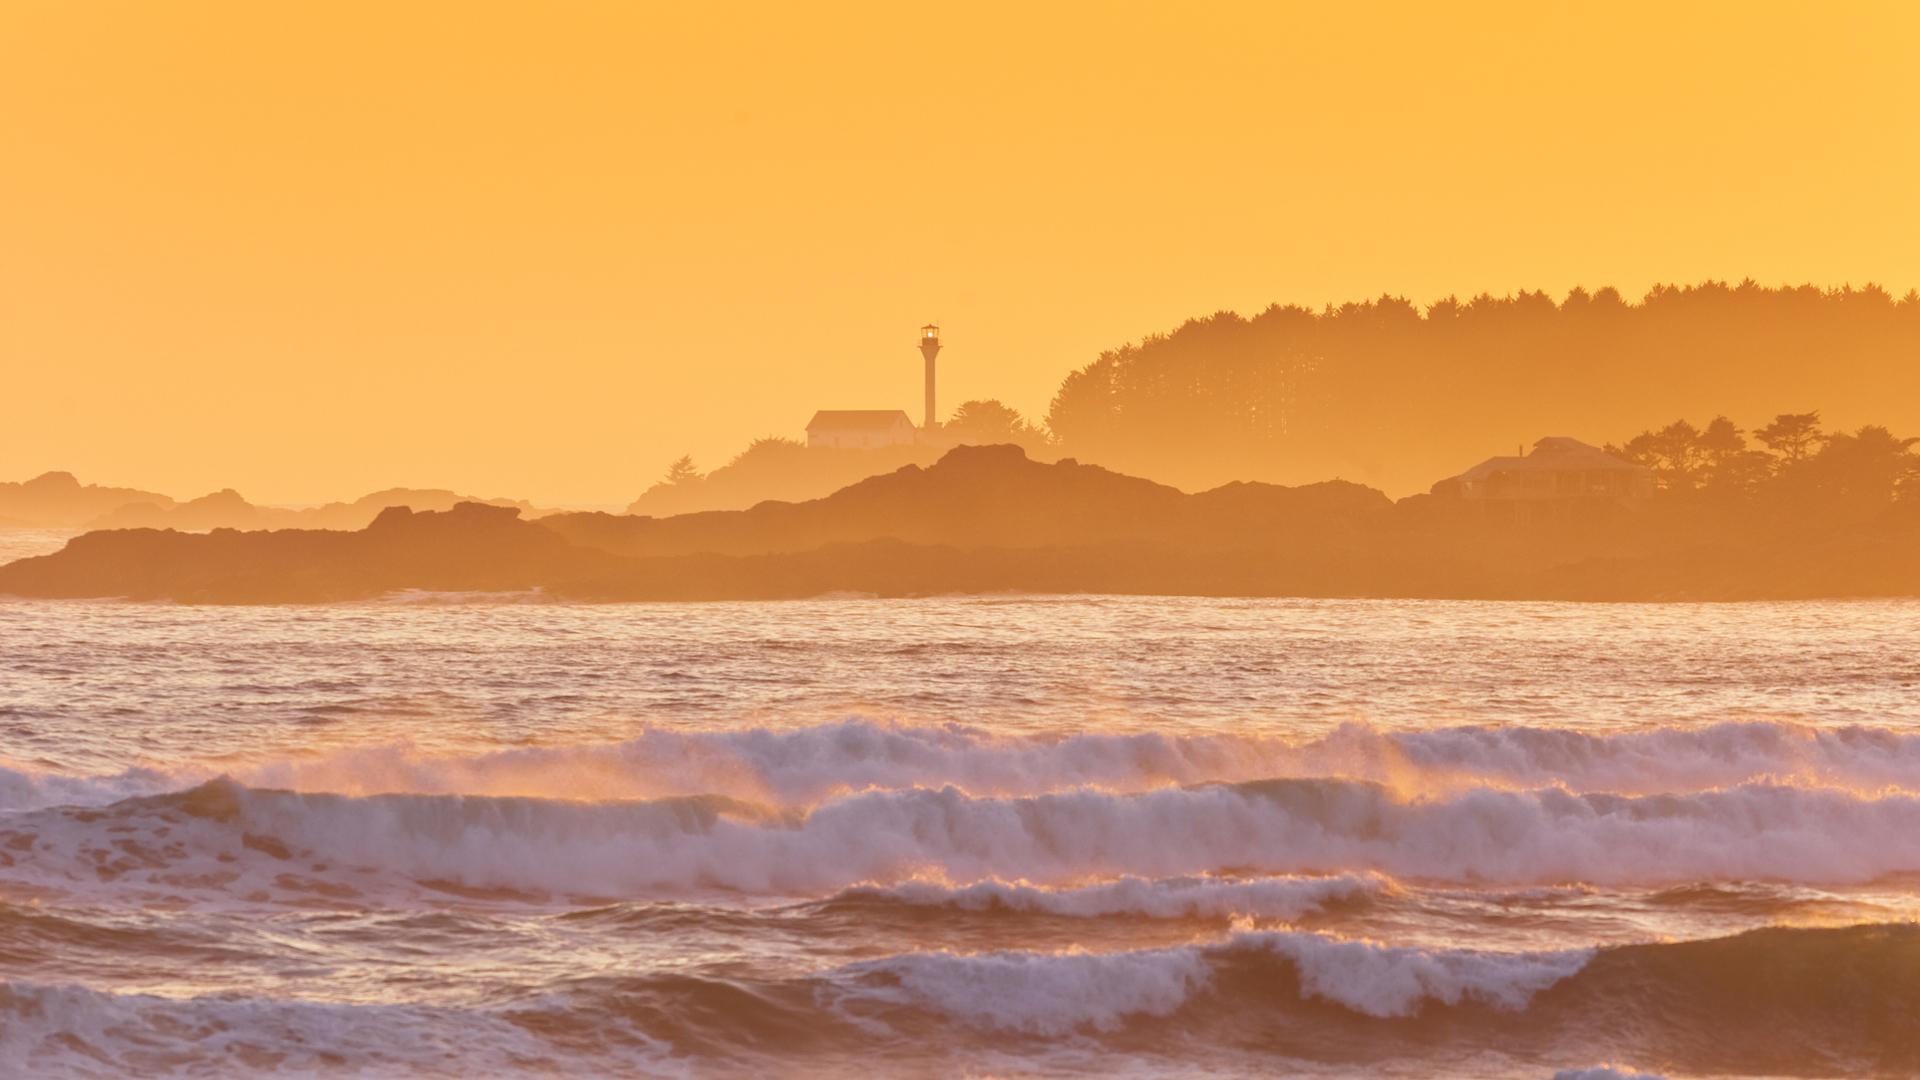 Courtesy Tourism Vancouver Island / Boomer Jerritt, Tofino Sunset, Healthy Living + Travel